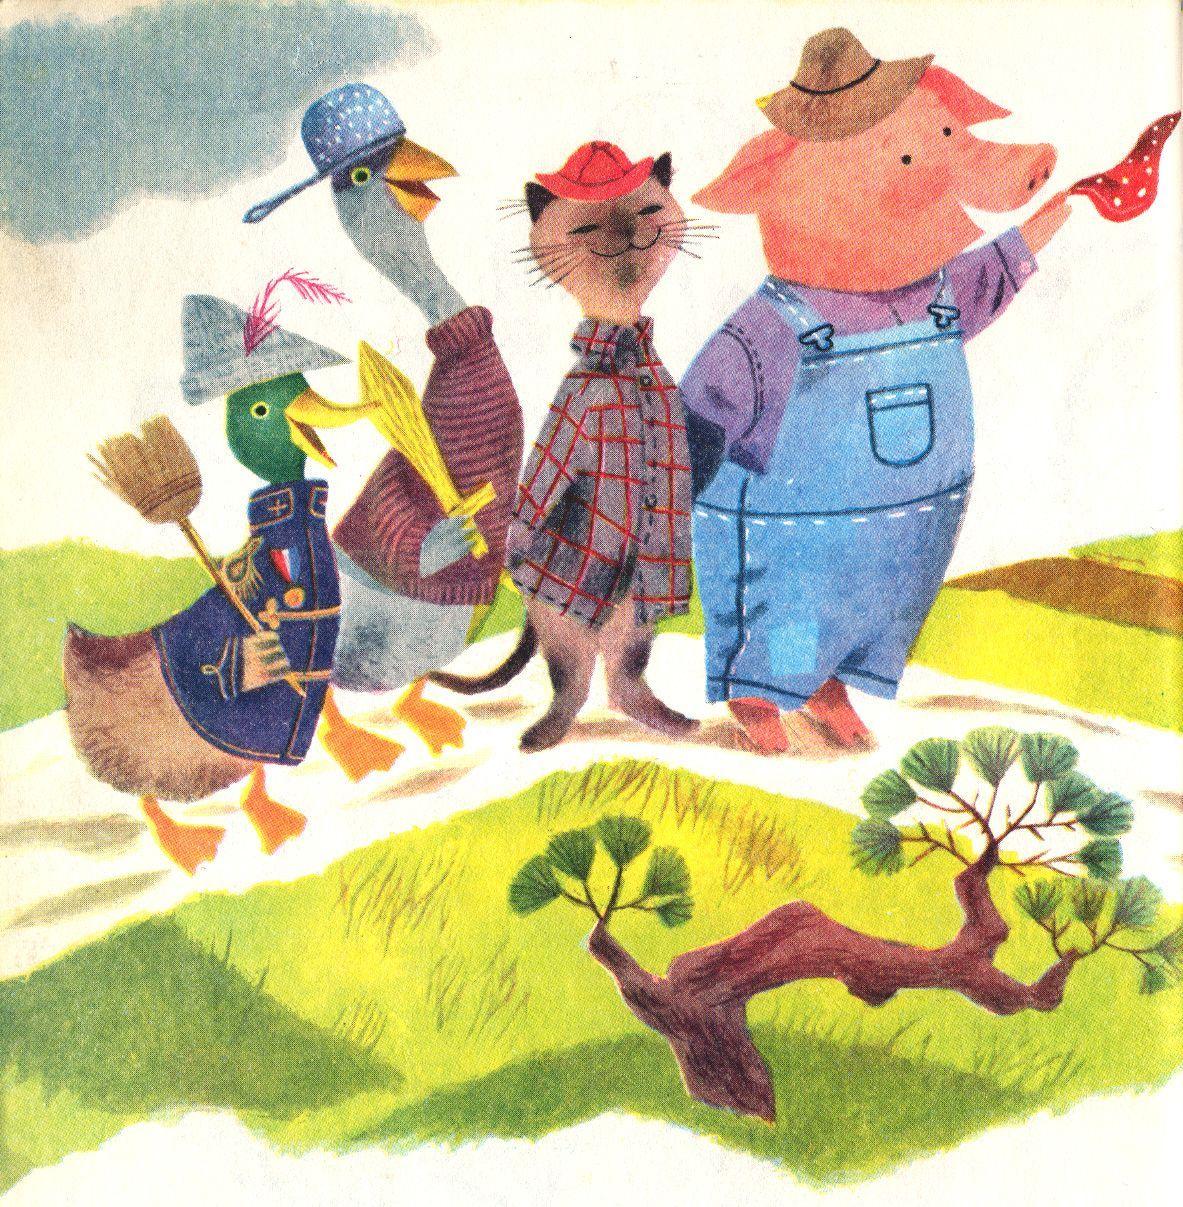 J P Miller Illustration Childrensbooks Picturebooks In 2020 Story Books Illustrations Vintage Illustration Childrens Books Illustrations